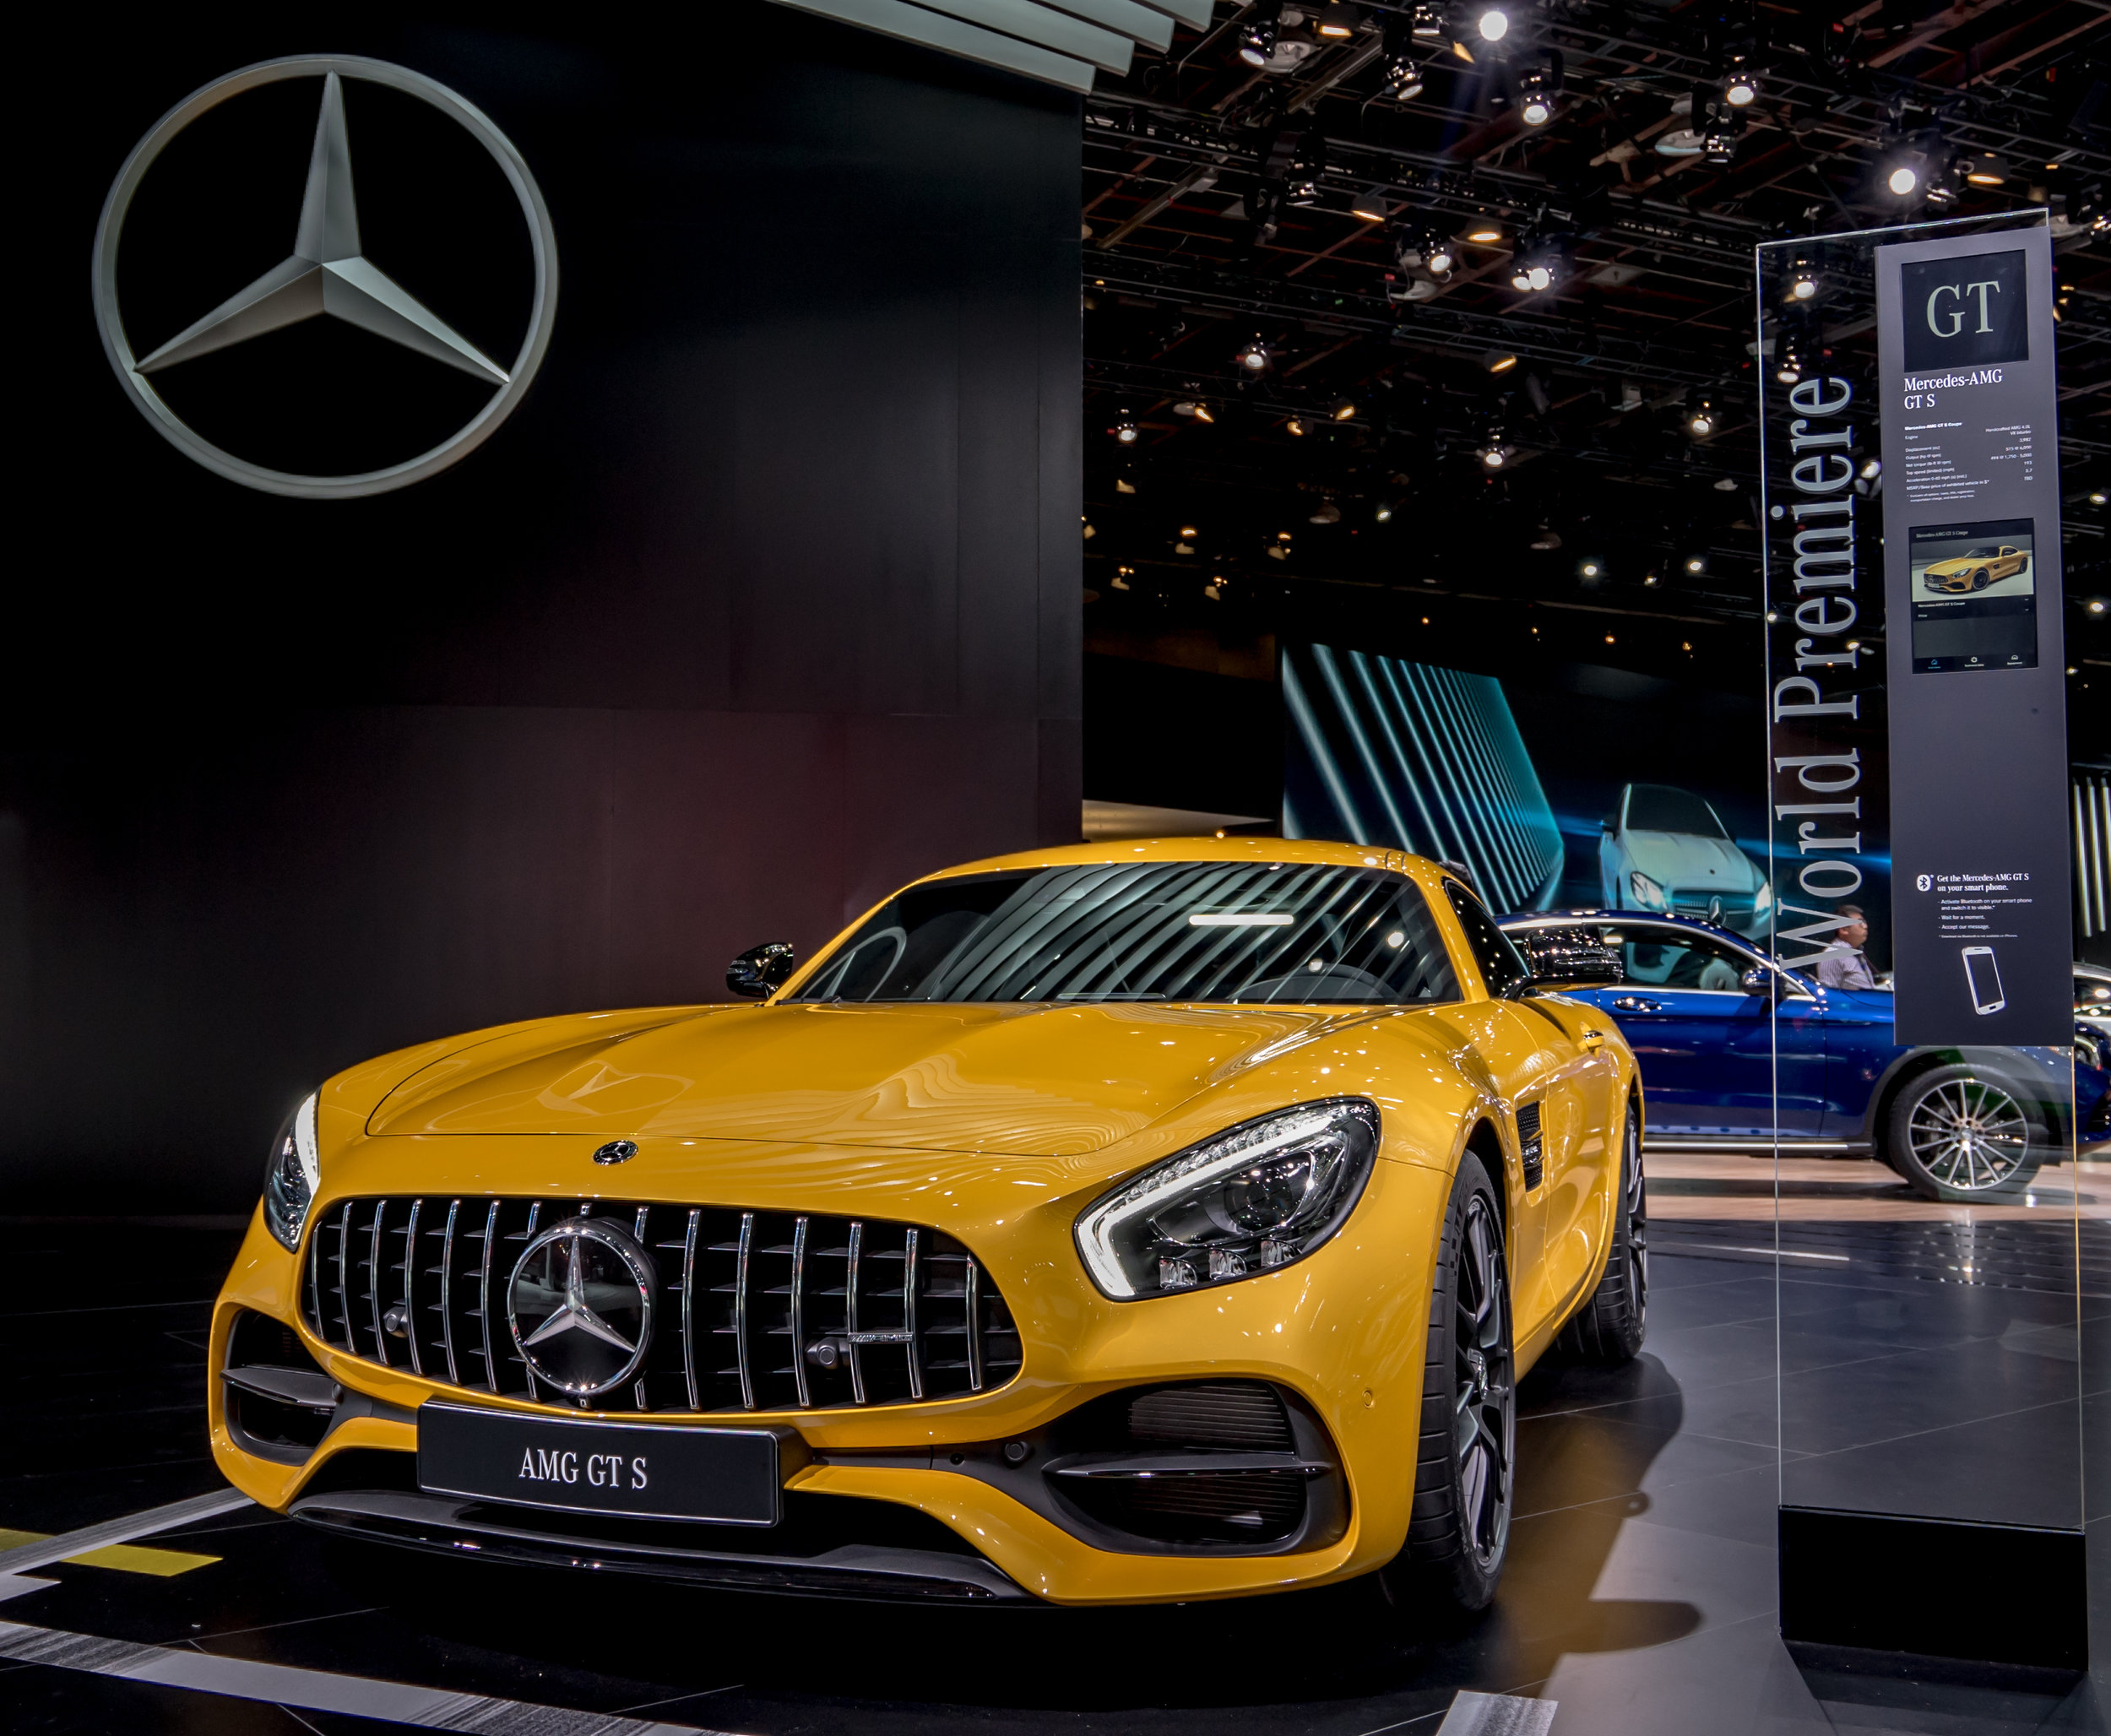 2017 Mercedes Benz AMG GT S